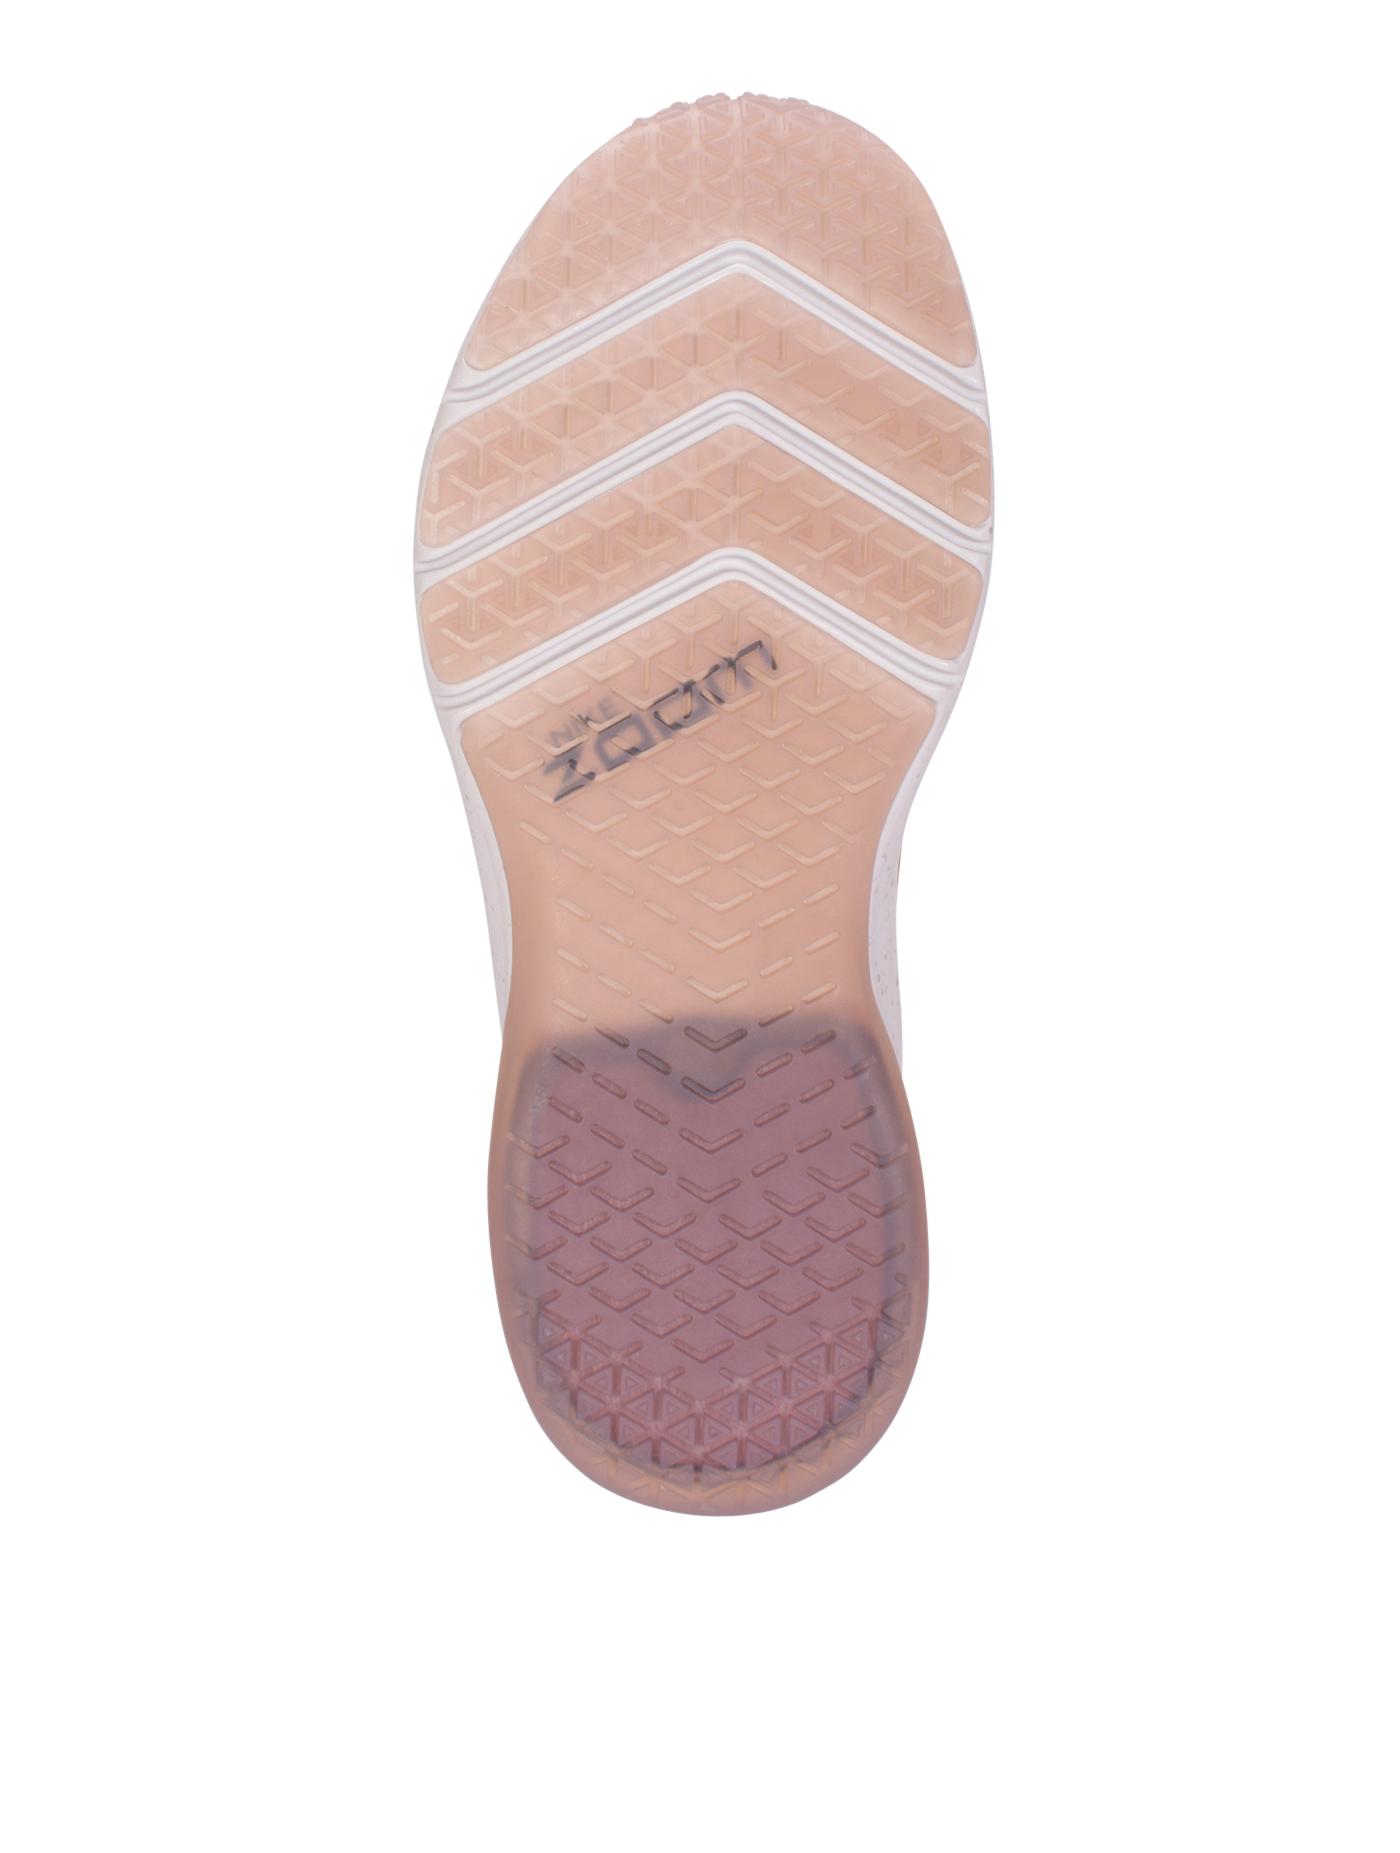 2c4647cb76385 NIKE รองเท้าวิ่งผู้หญิง Air Zoom Fearless Flyknit 2LM สีน้ำตาล ไซส์ 7.5